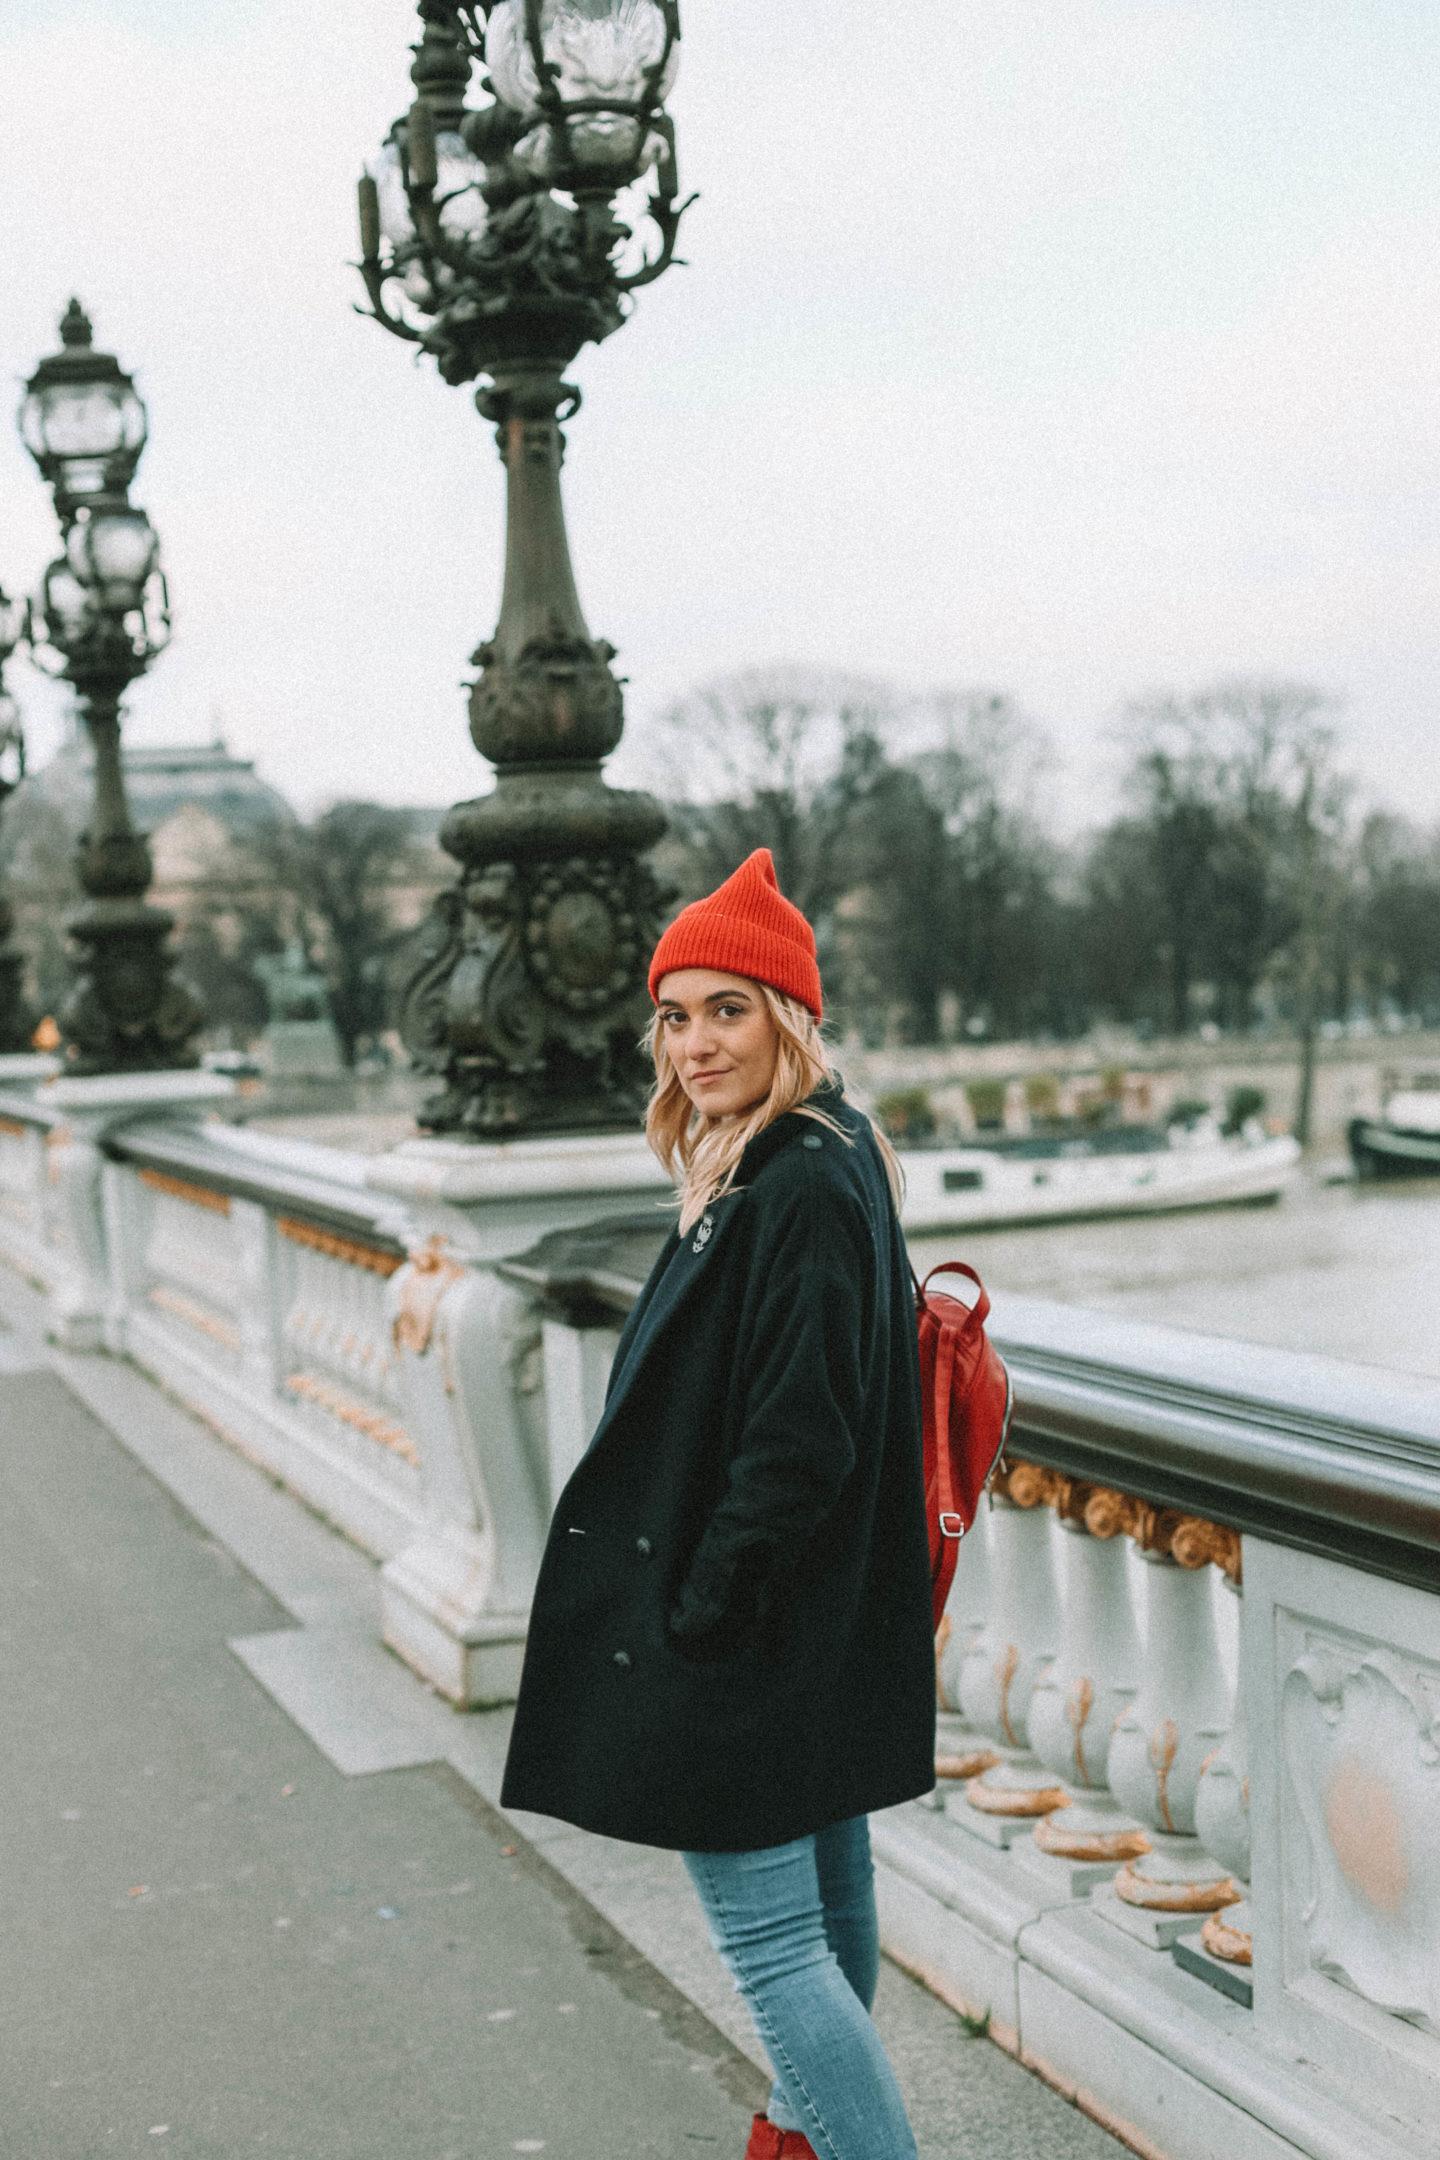 Paris - Blondie Baby blog mode et voyages